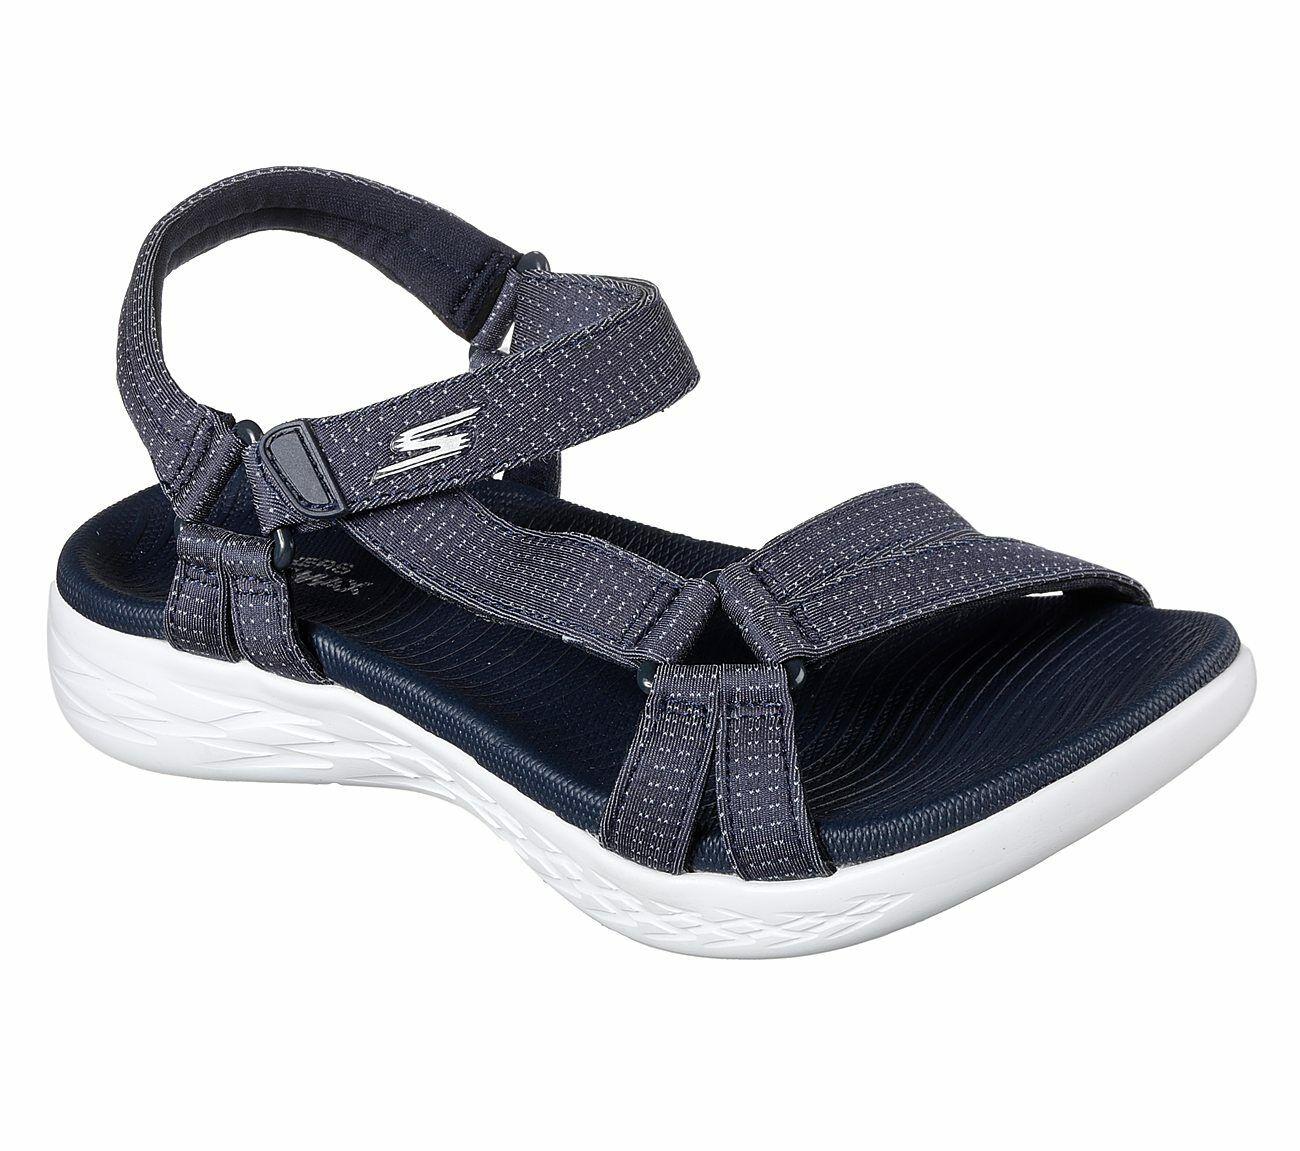 Details zu Skechers On The Go 600 Brilliancy Sandals Womens Memory Foam Strap GoRun 15316